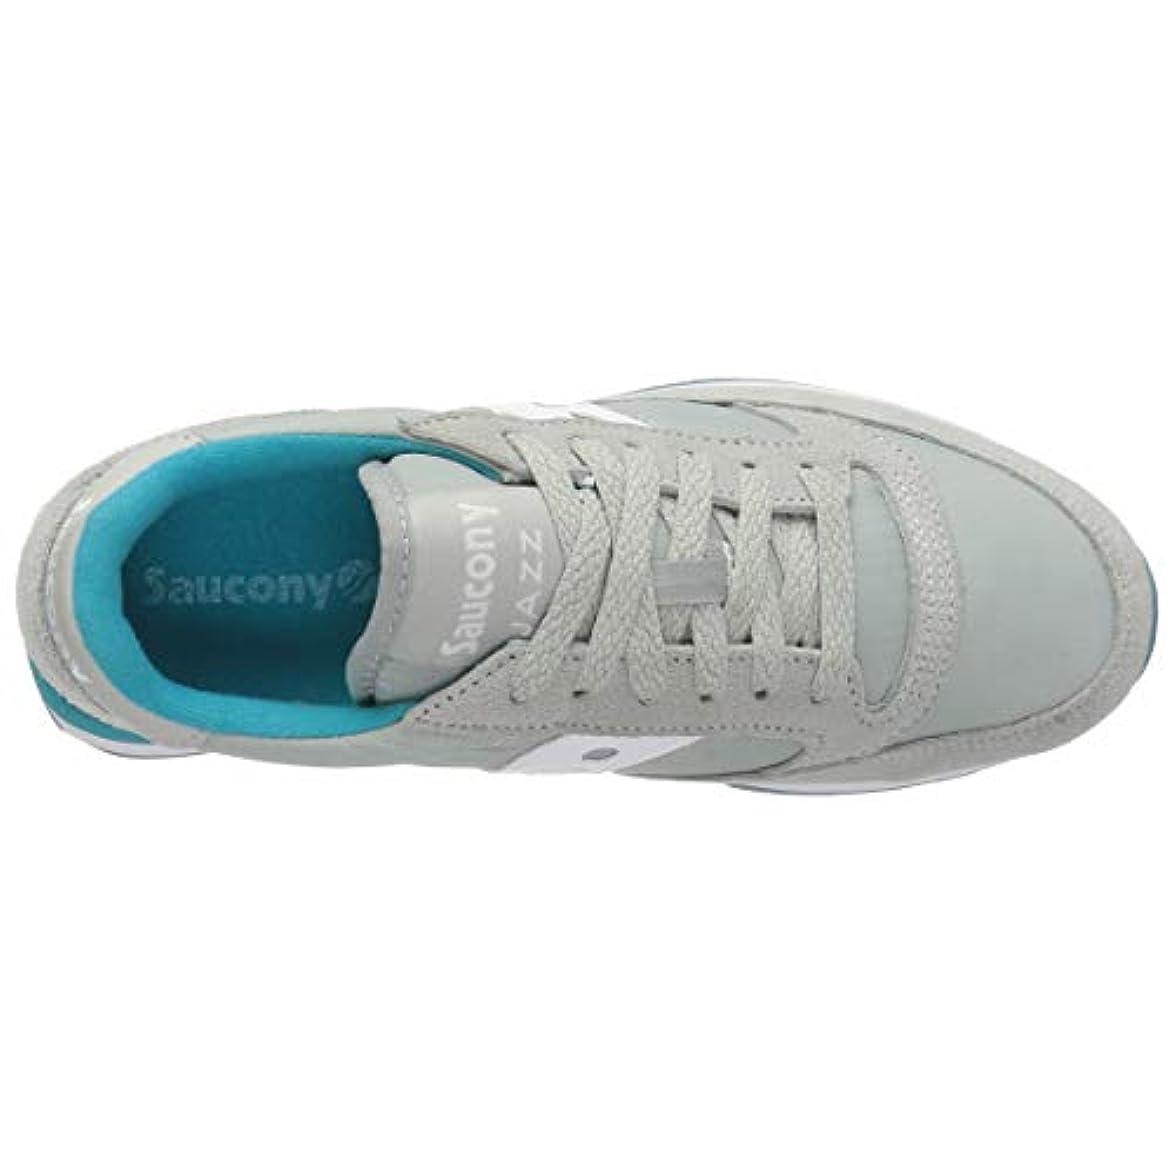 Sneakers Donna Sauony Originals Mod Jazz O Art 1044 391 Colore Arancione